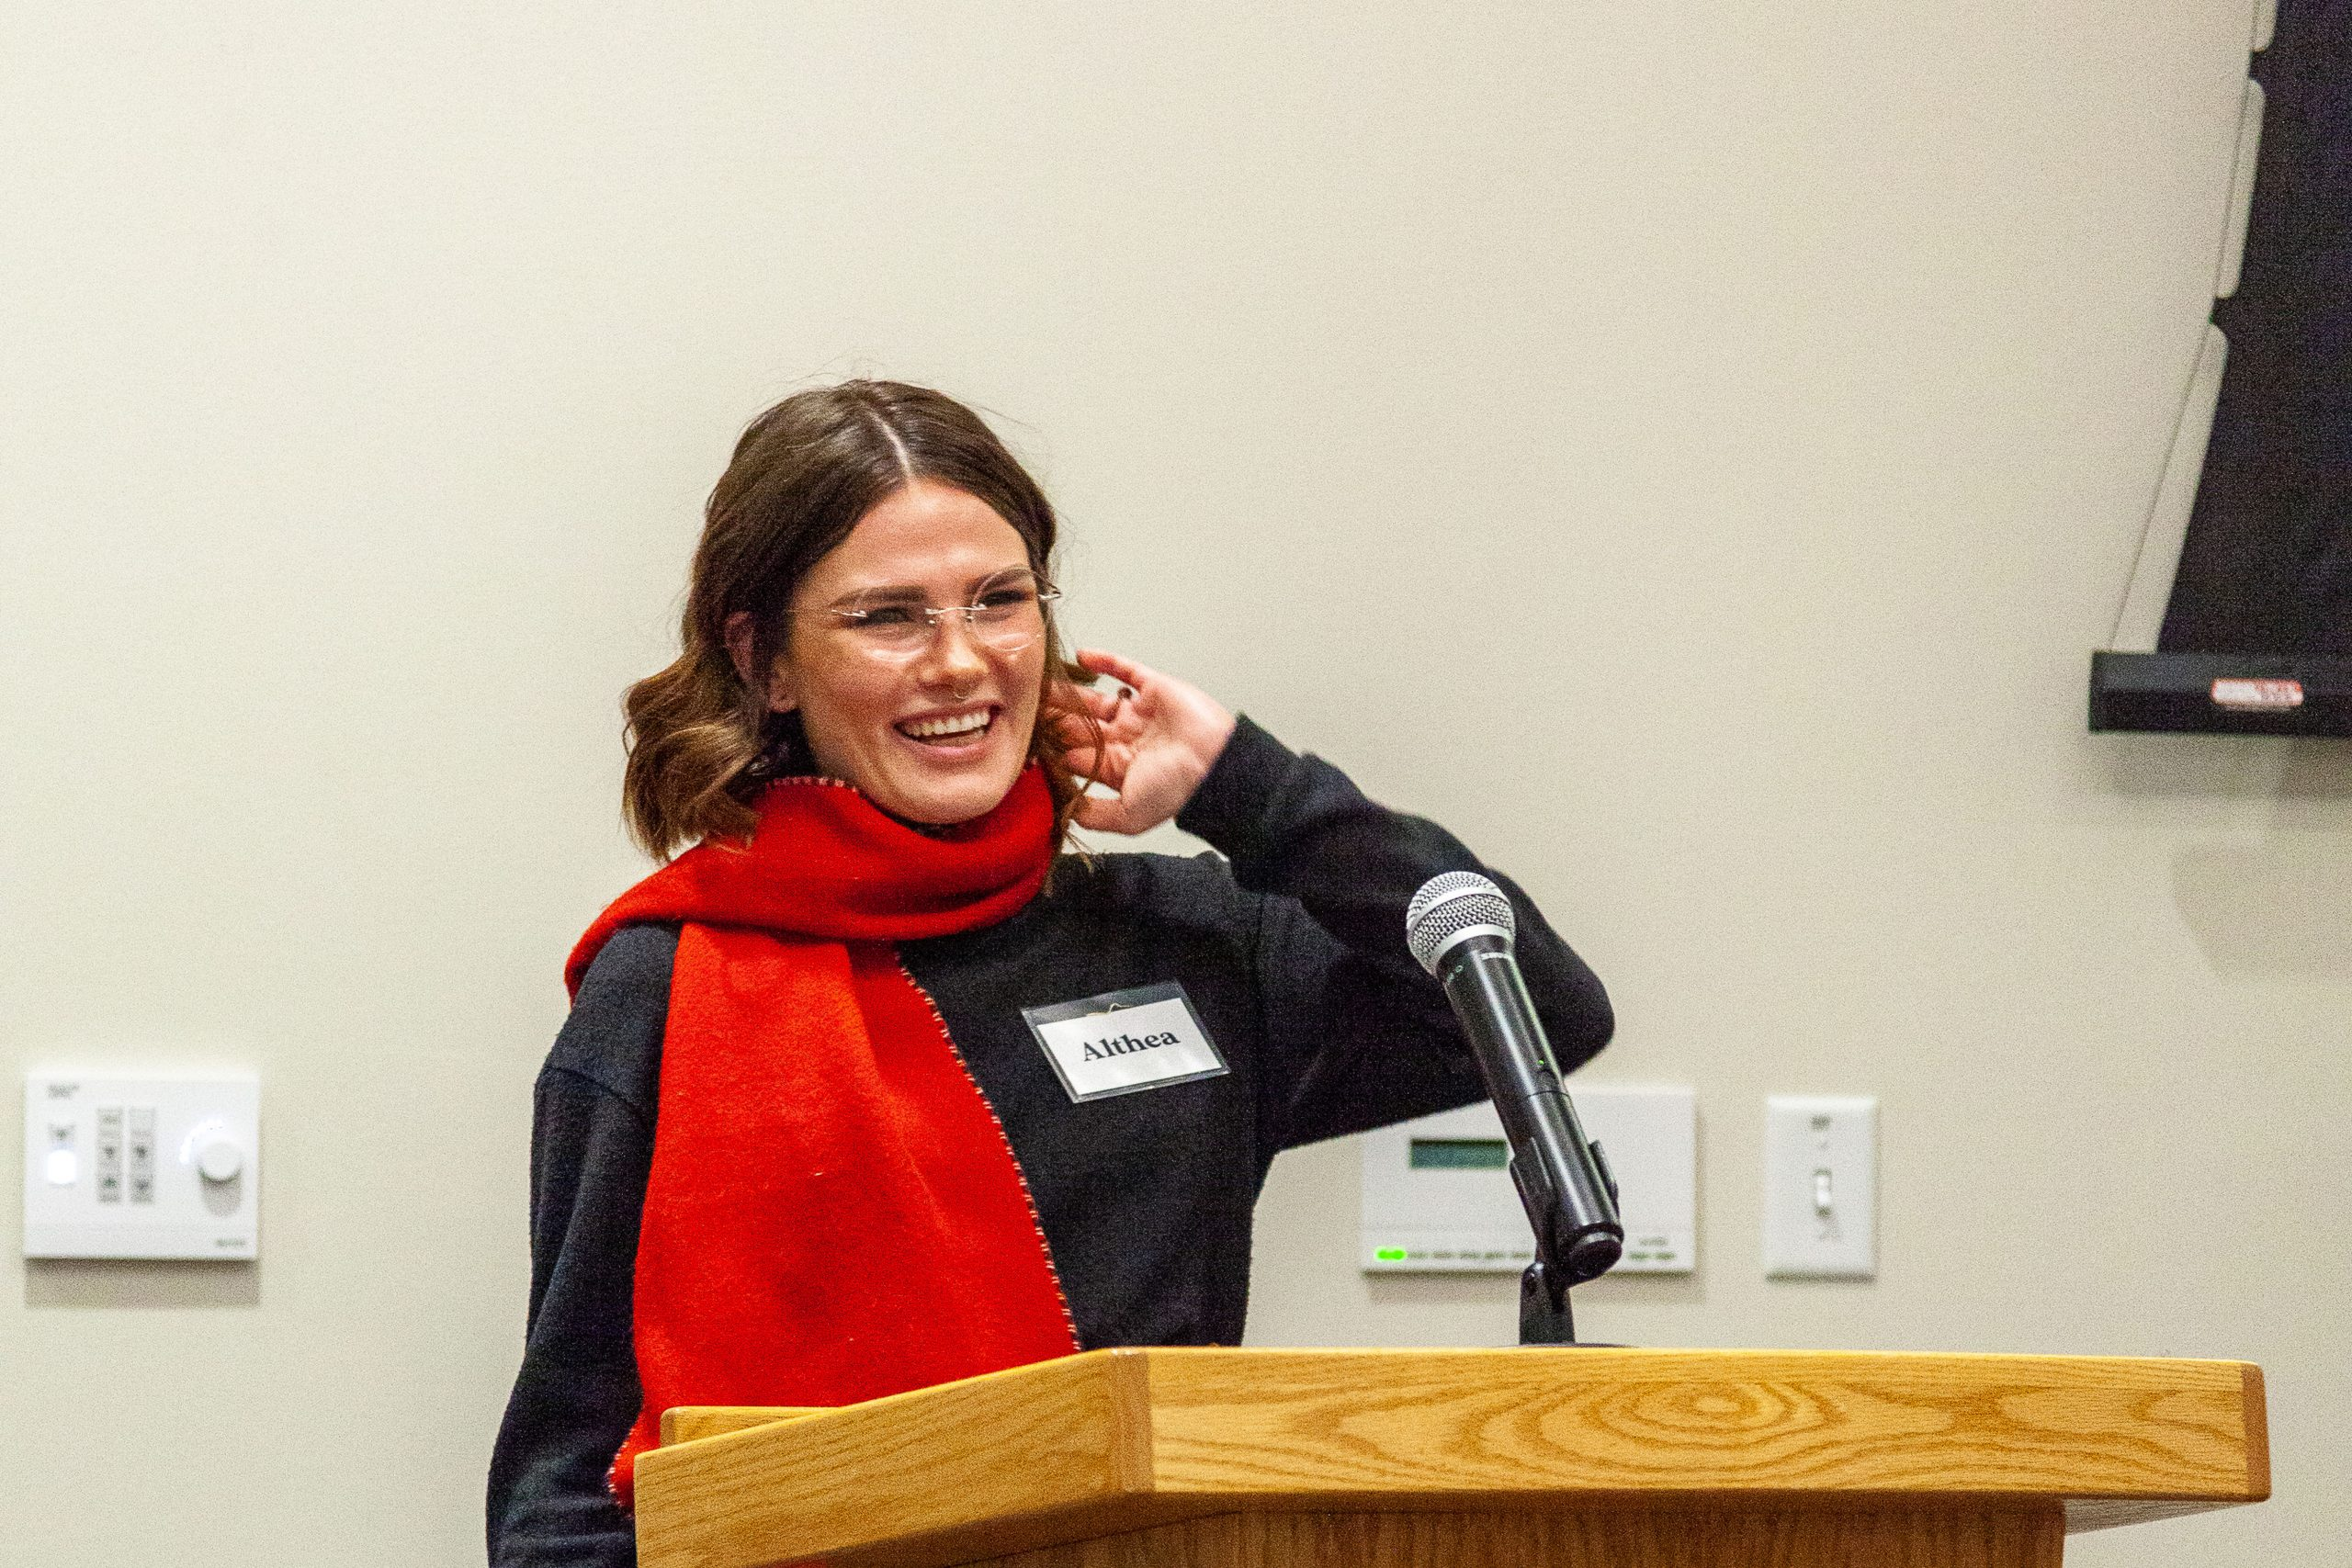 Althea at the podium.